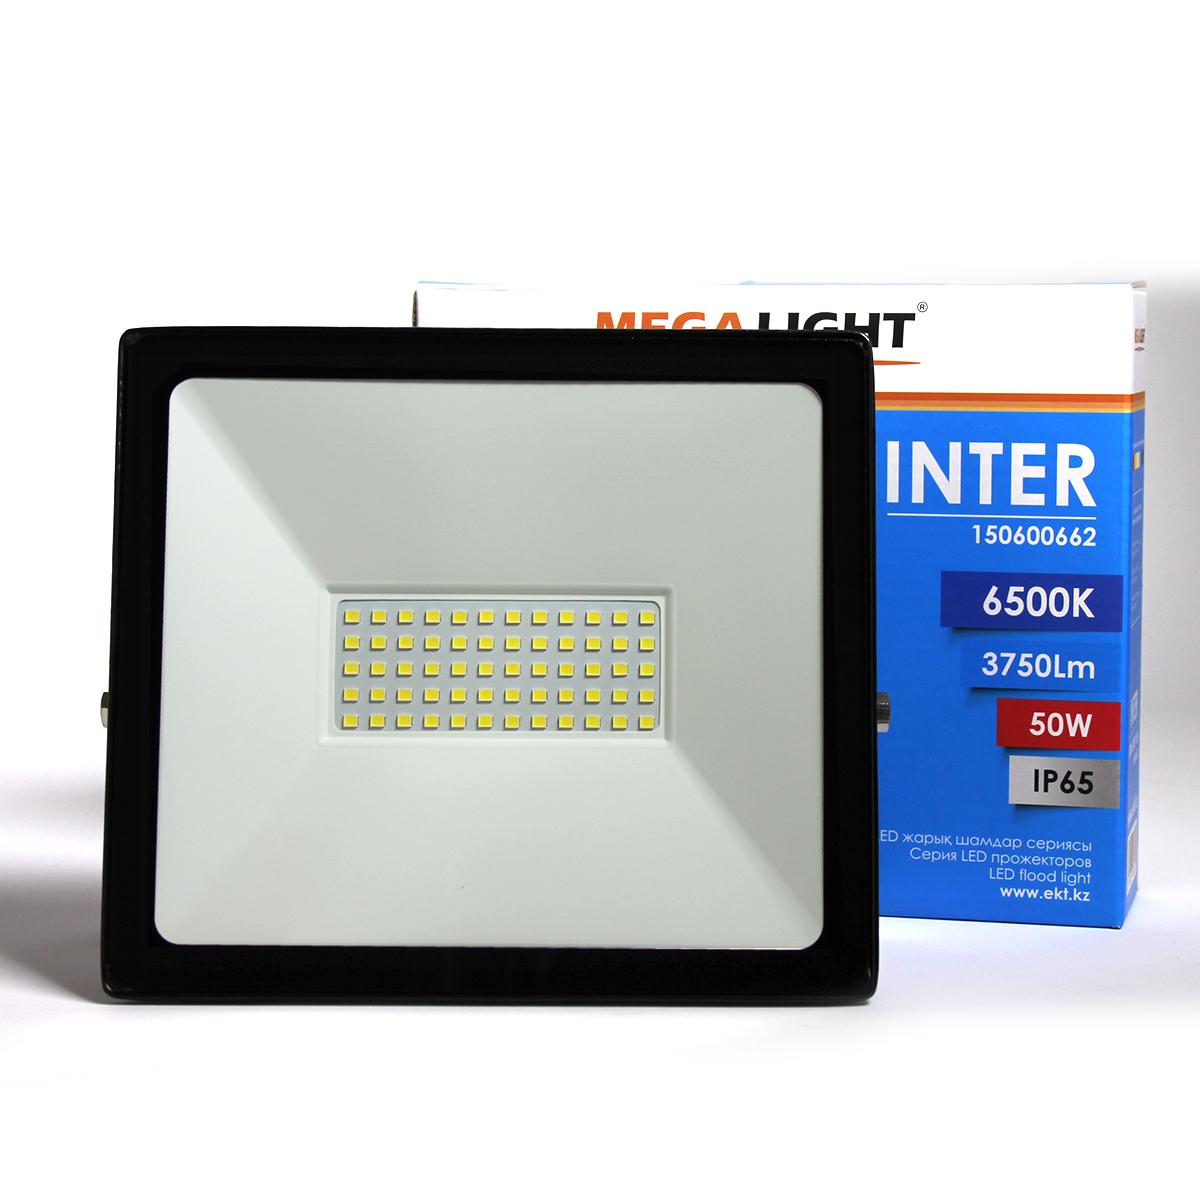 LED Прожектор INTER 50W 6500K IP65 MEGALIGHT(20)